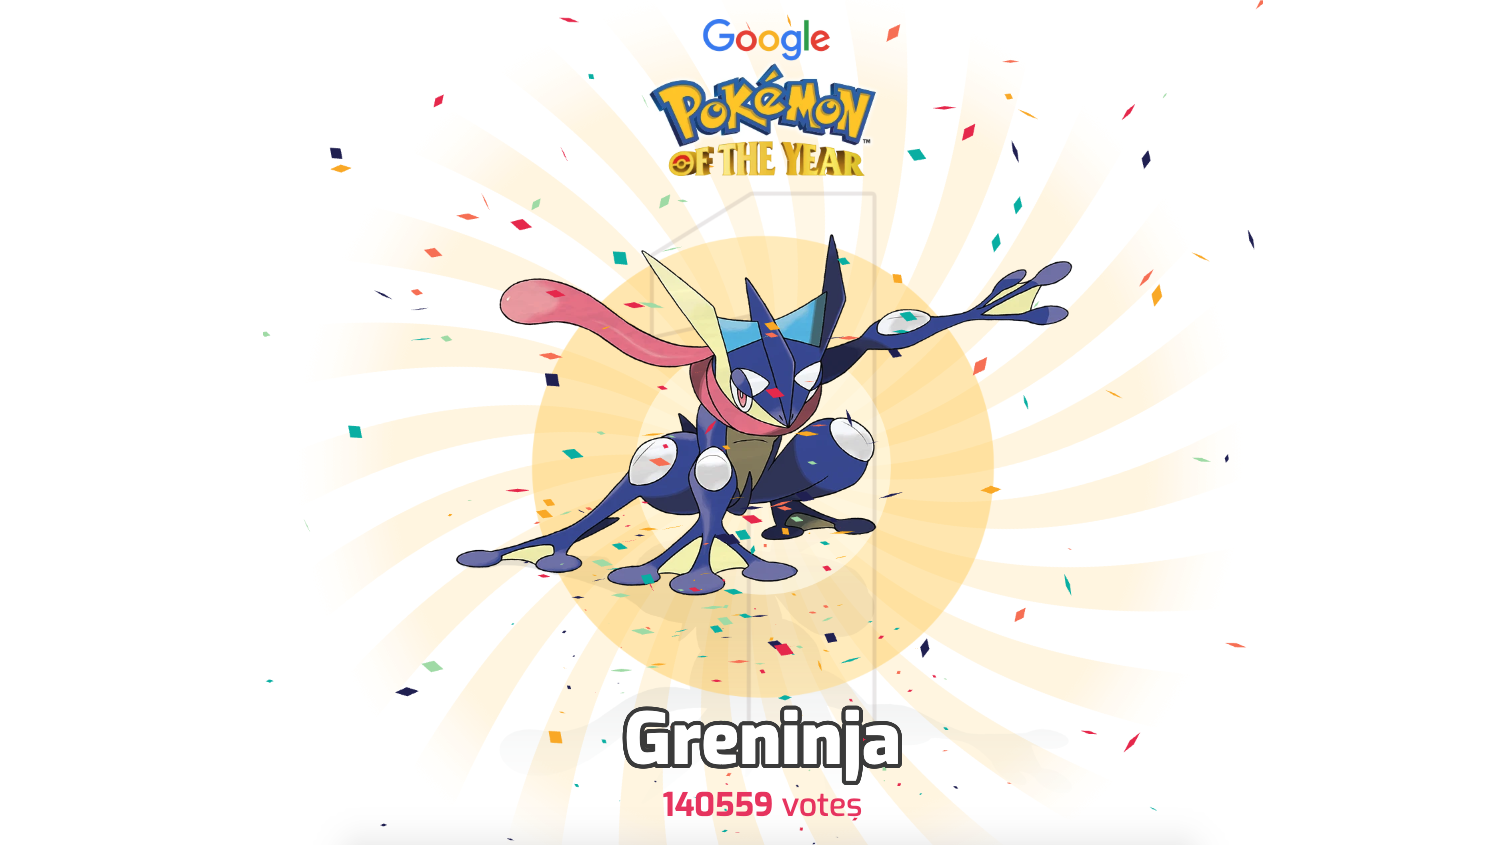 Google เผยอันดับ Pokemon of The Year แชมป์ปีนี้ได้แก่ กบนินจาสุดหล่อ Greninja